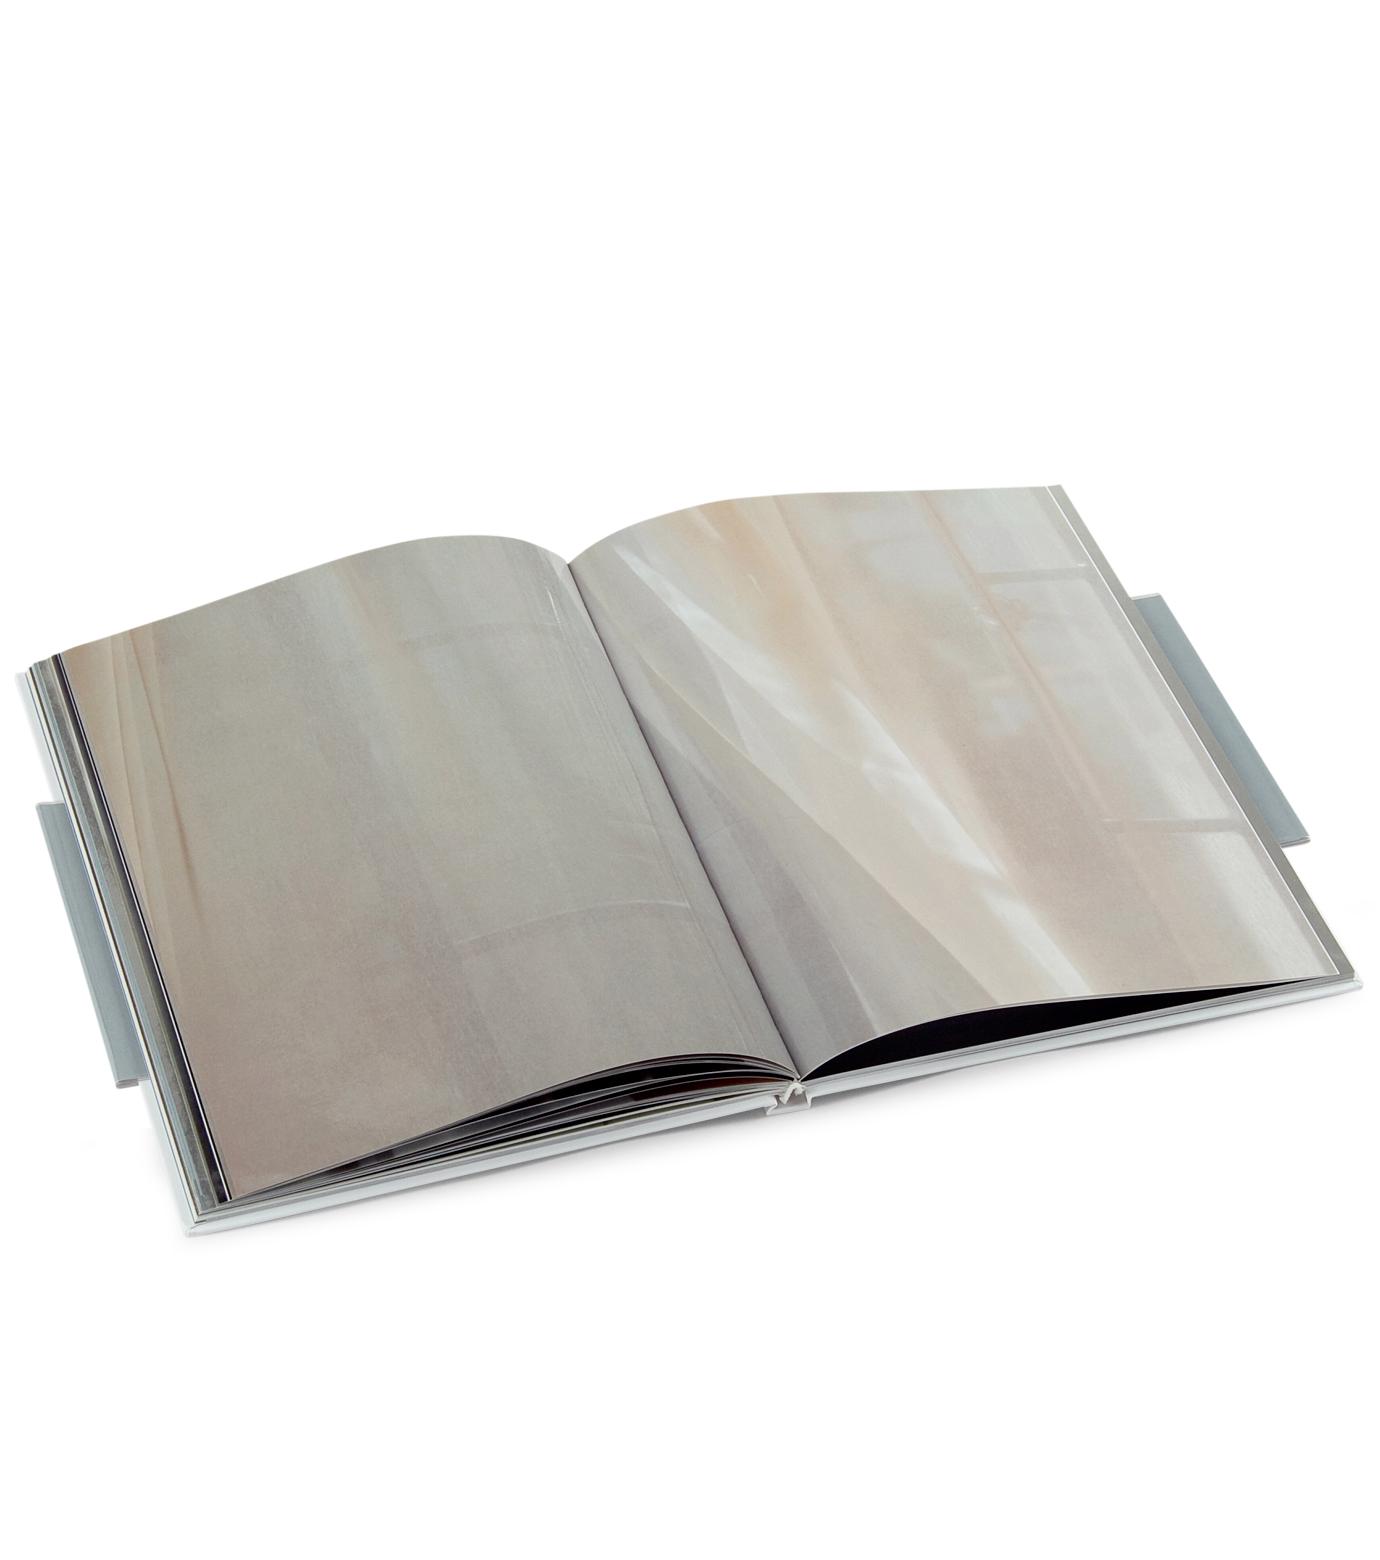 ArtBook(アートブック)のHedi slimane: intermission, 1.-WHITE-8158-374-4-4 拡大詳細画像4